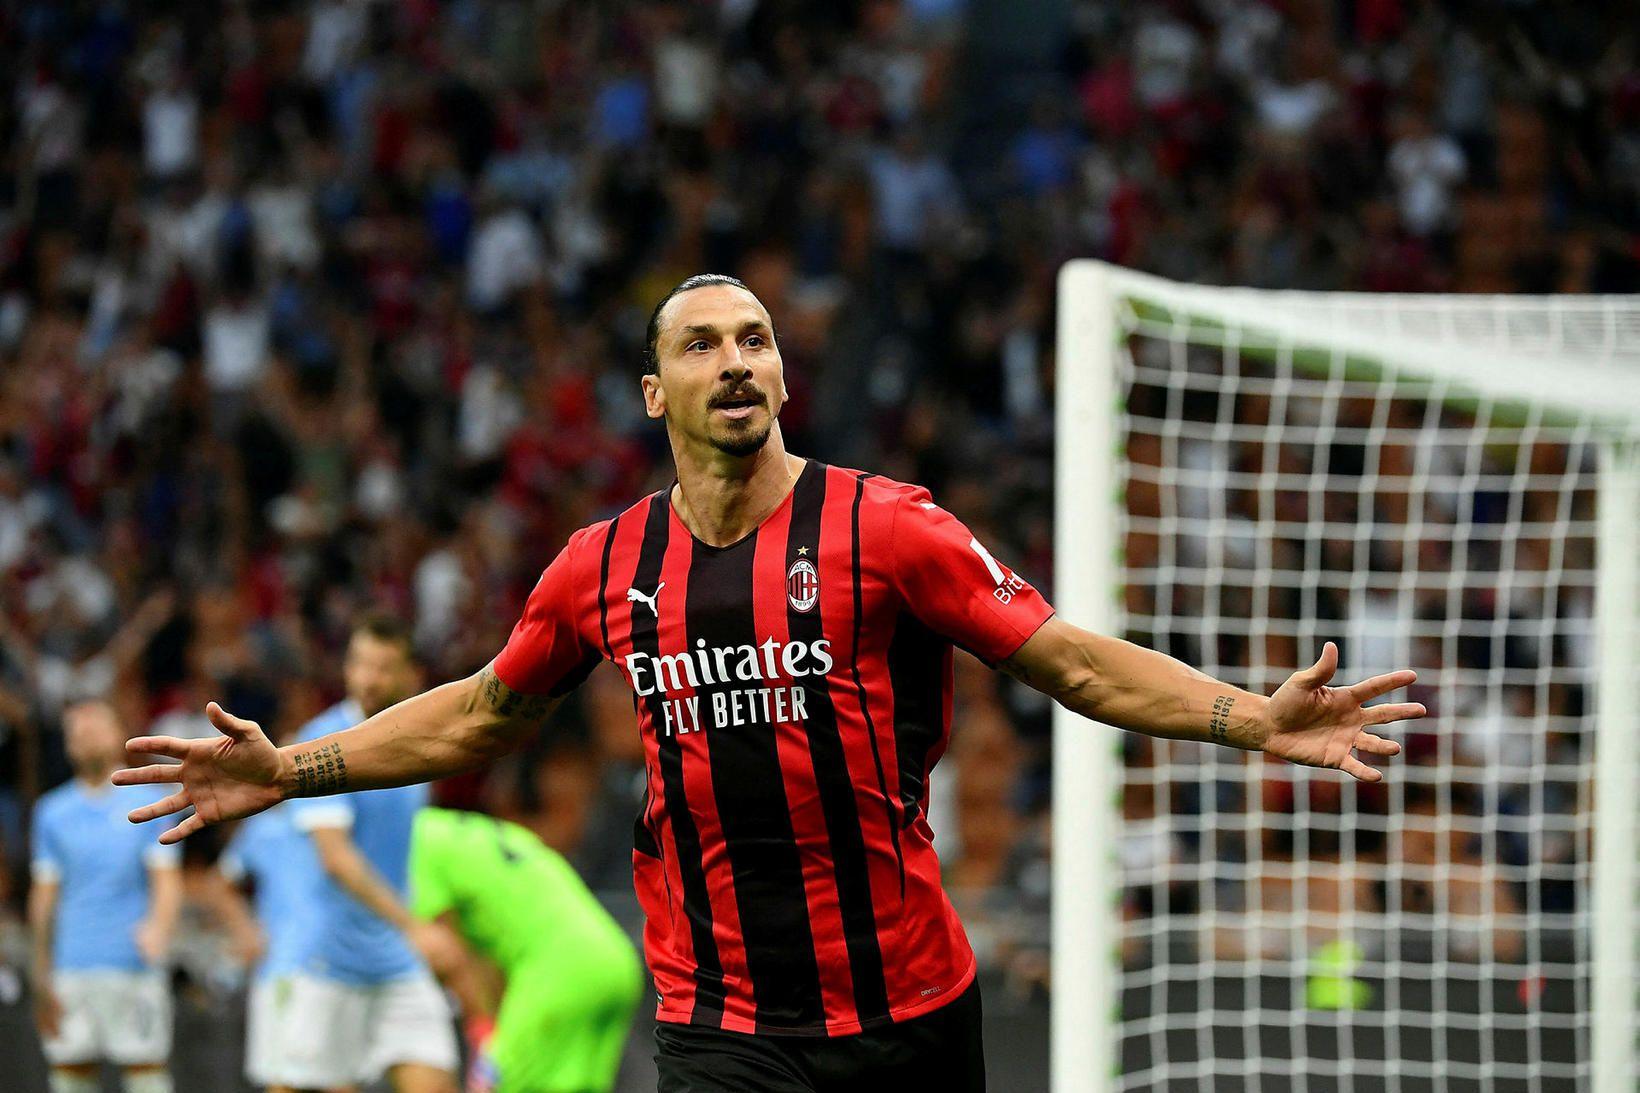 Zlatan Ibrahimovic hefur óbilandi trú á sjálfum sér.